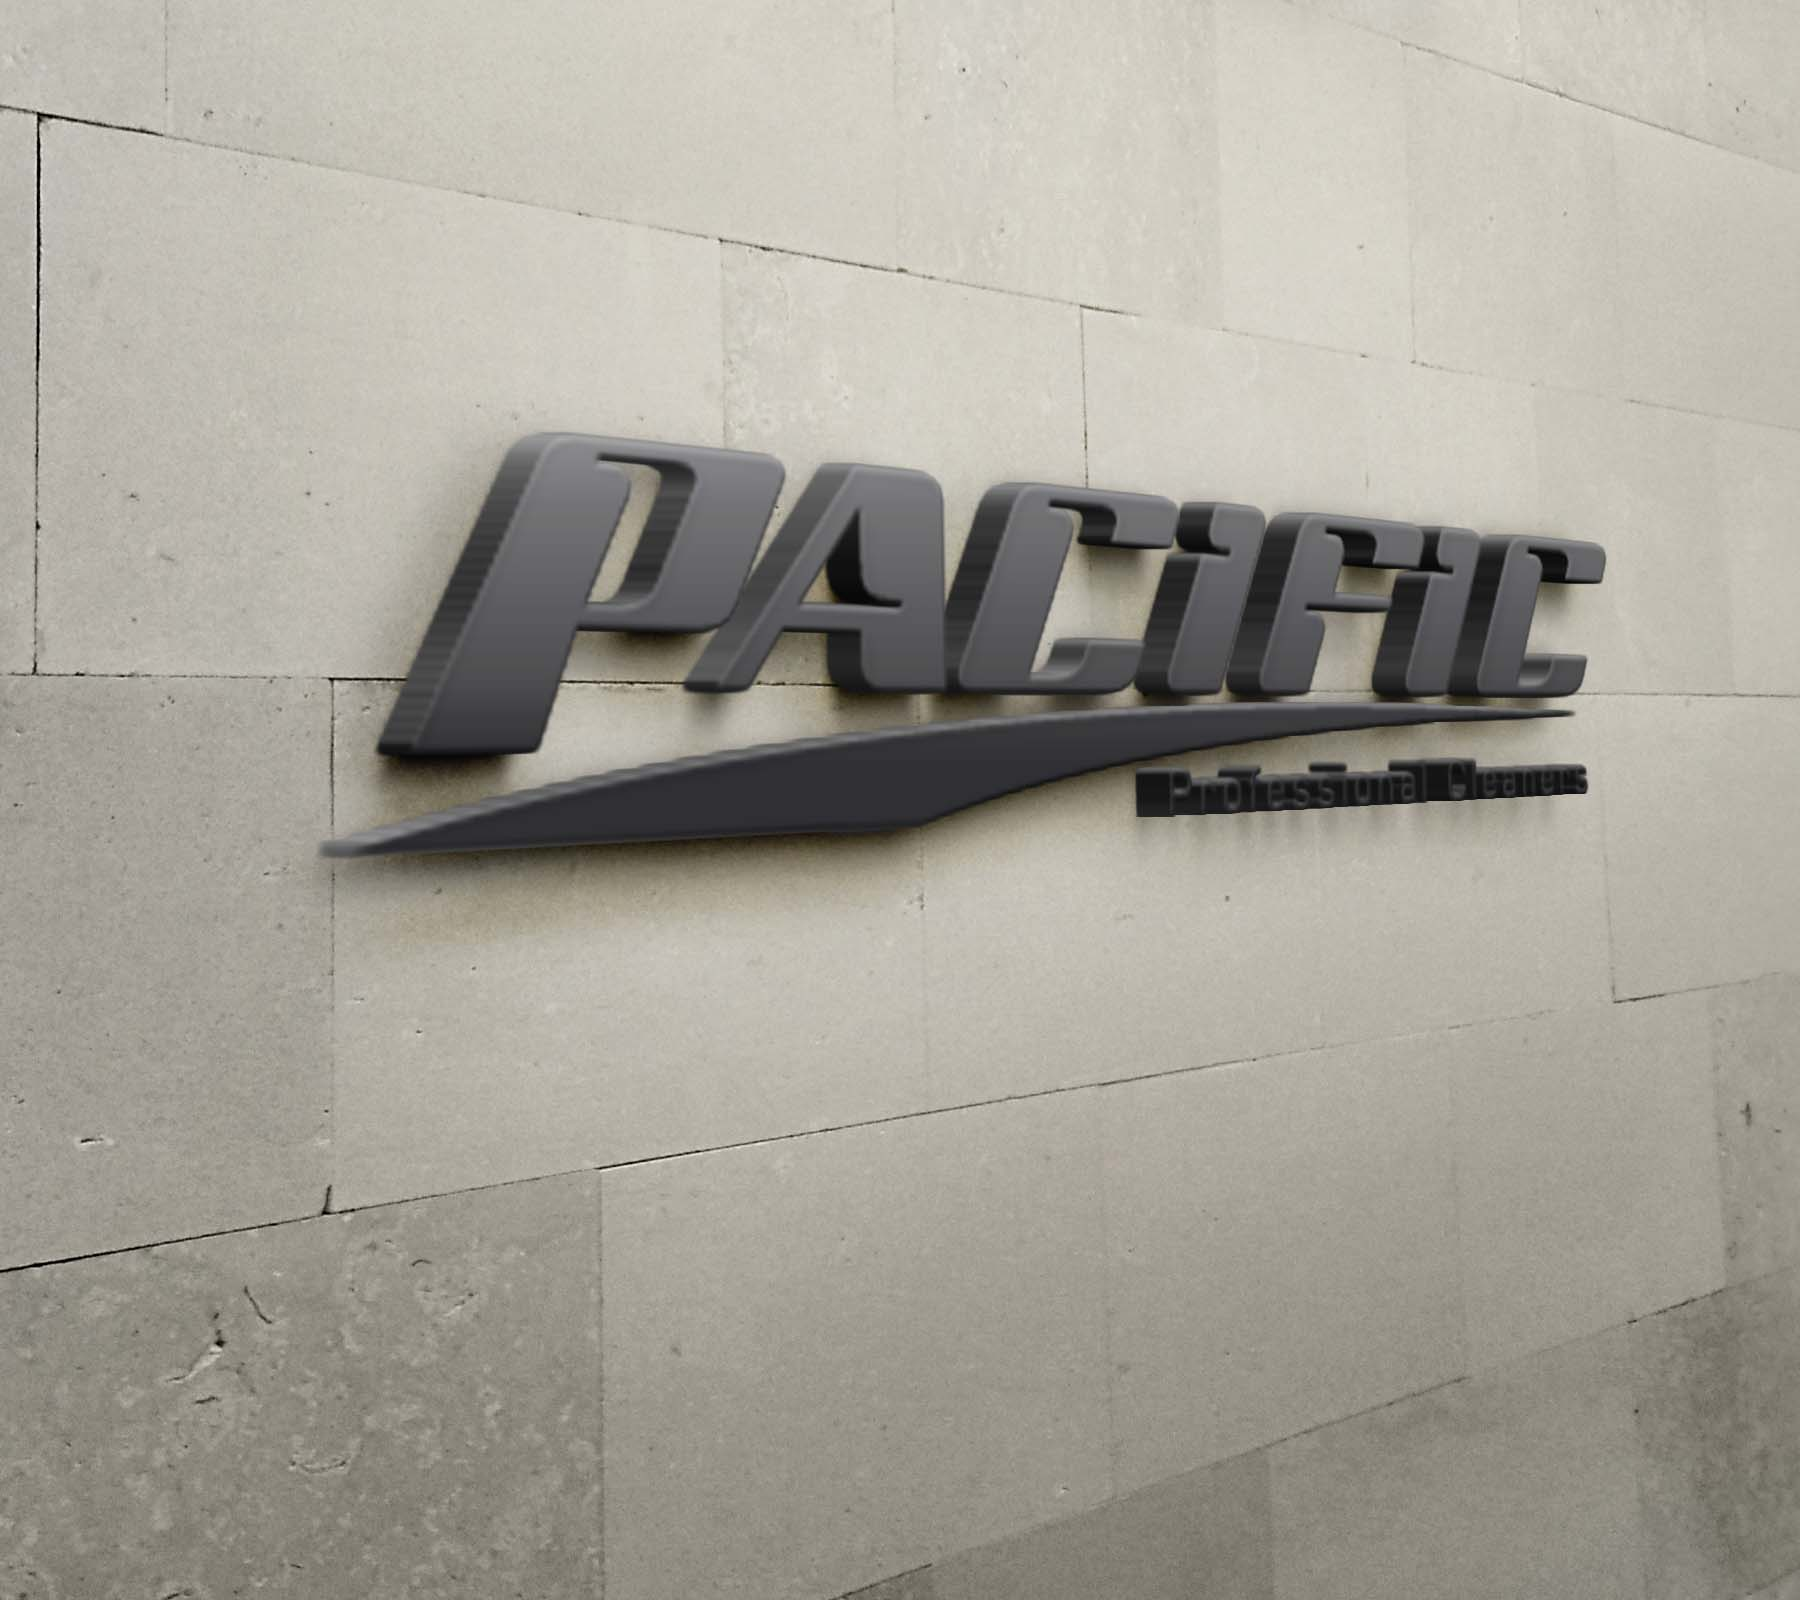 pacific - Copy